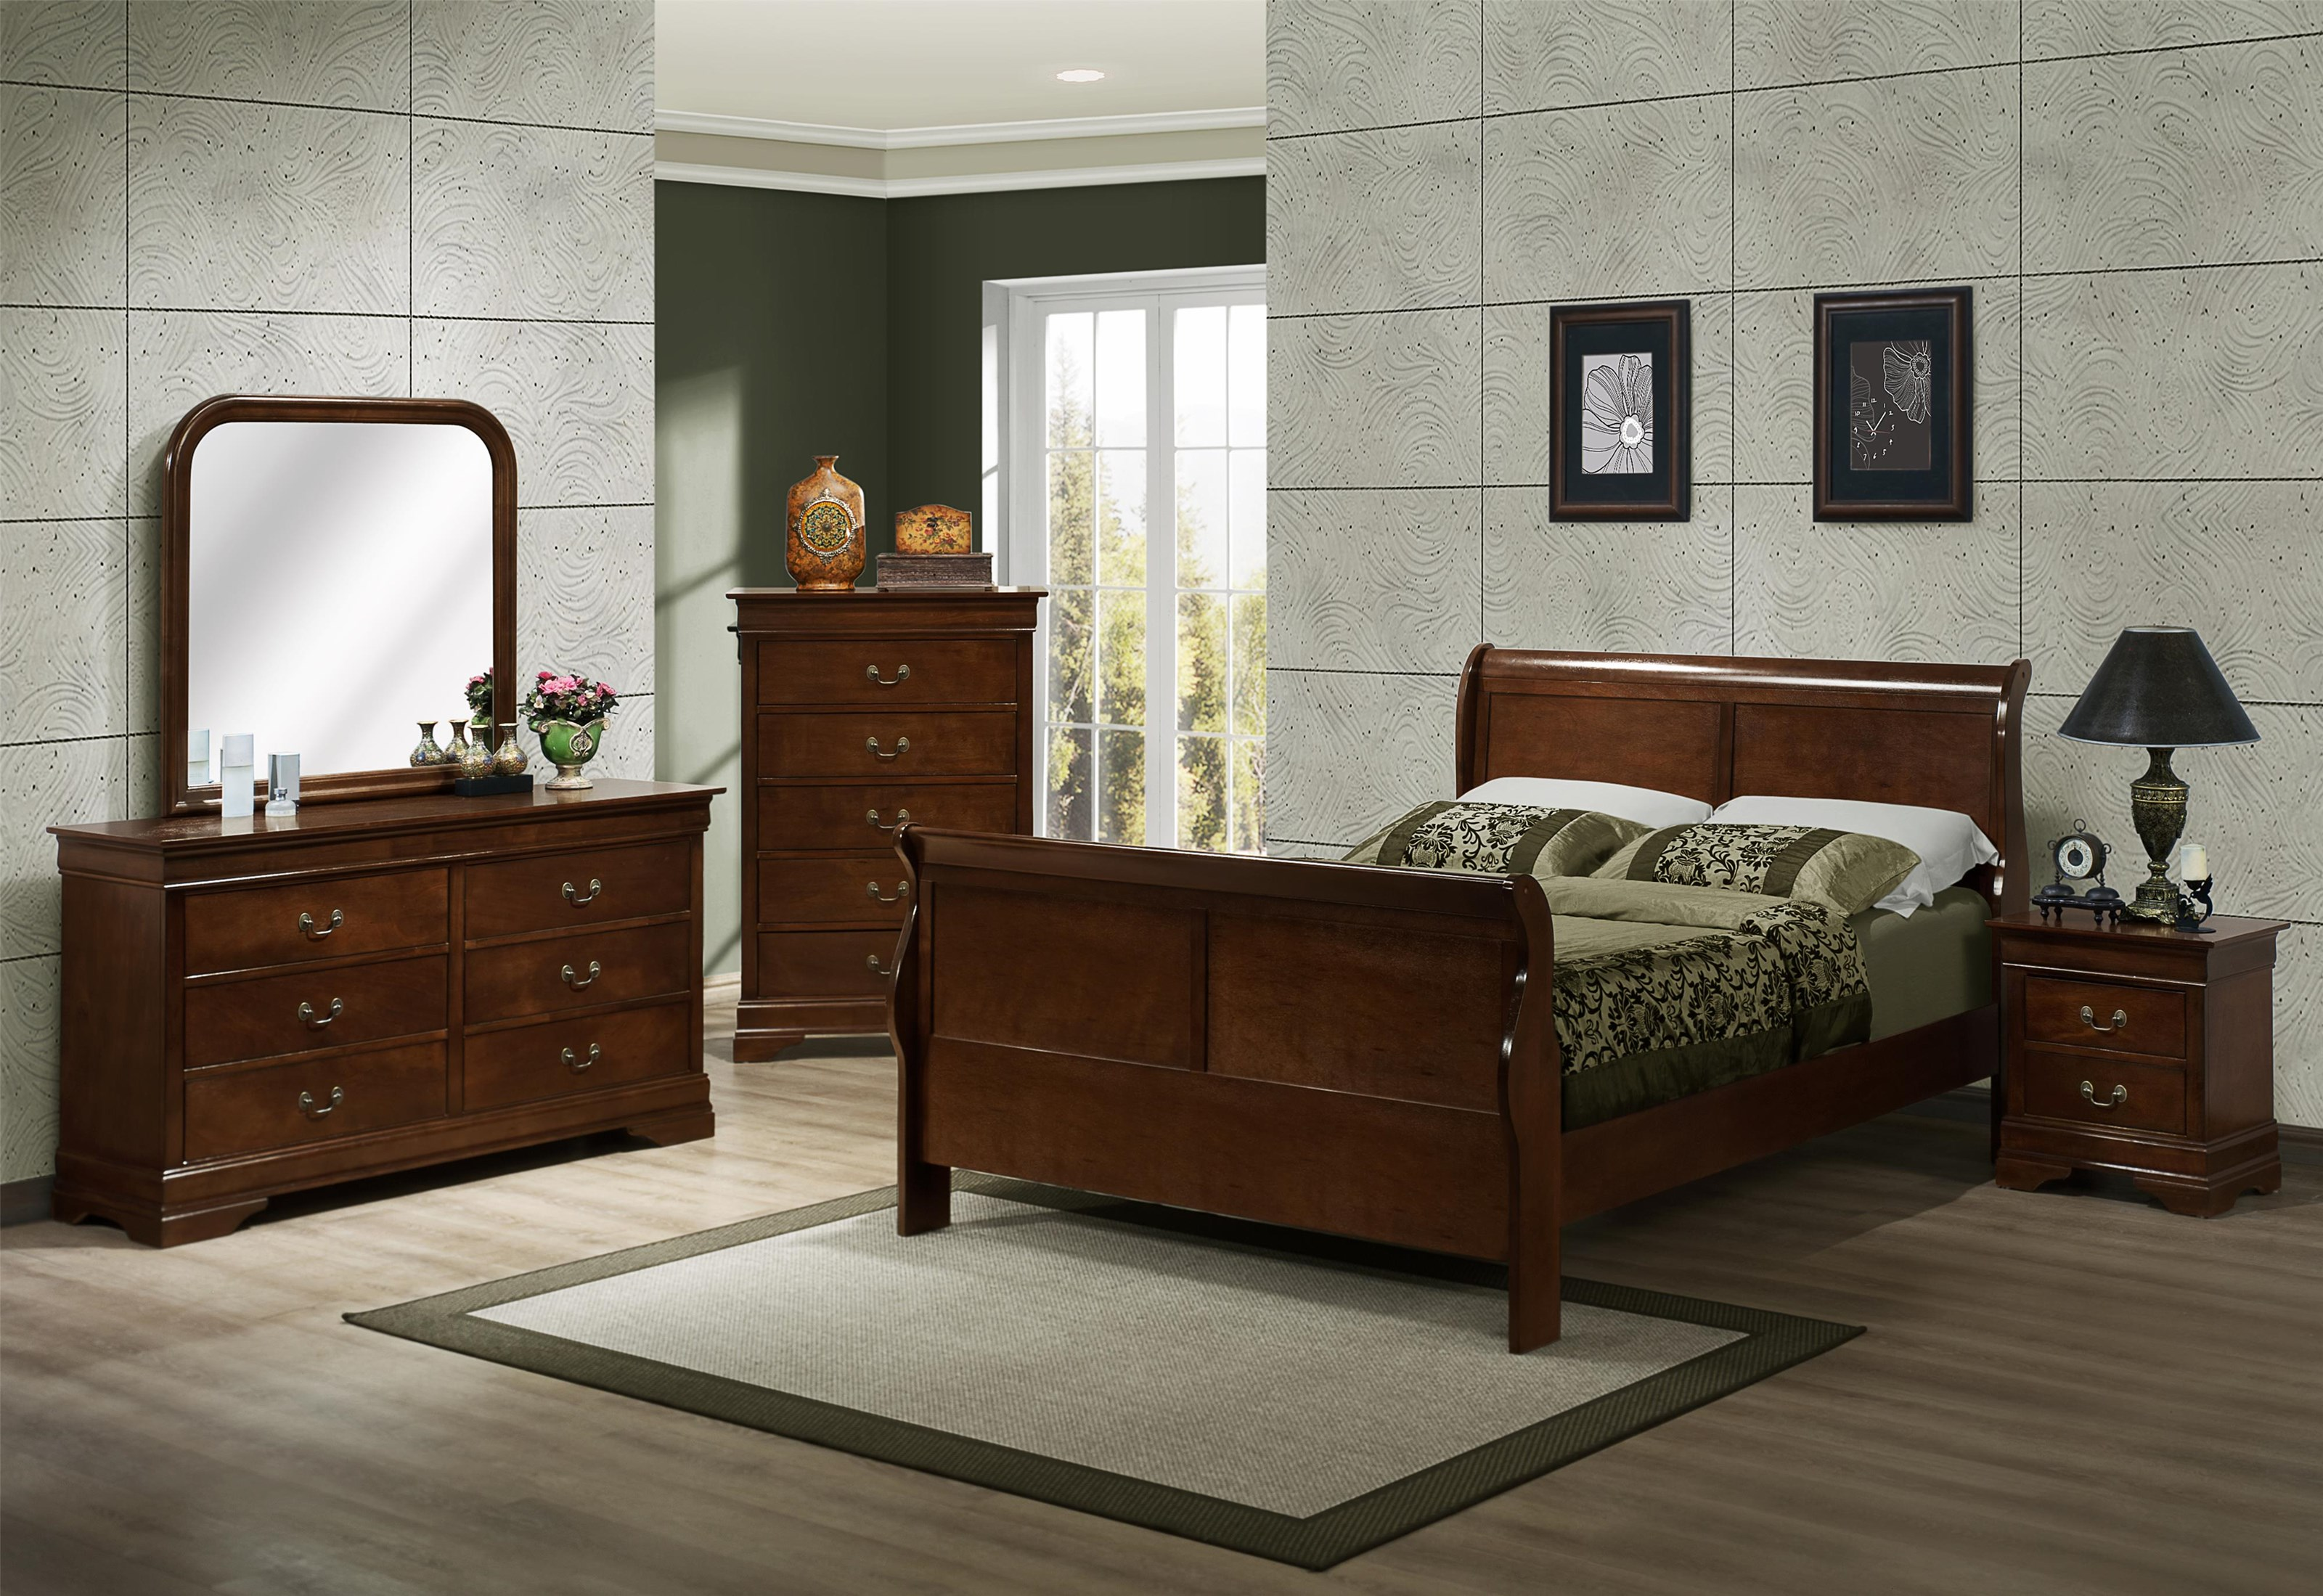 Austin Group Marseille Twin Bed, Dresser, Mirror, & Nightstand - Item Number: AUGR-GRP-329-TWINSUITE